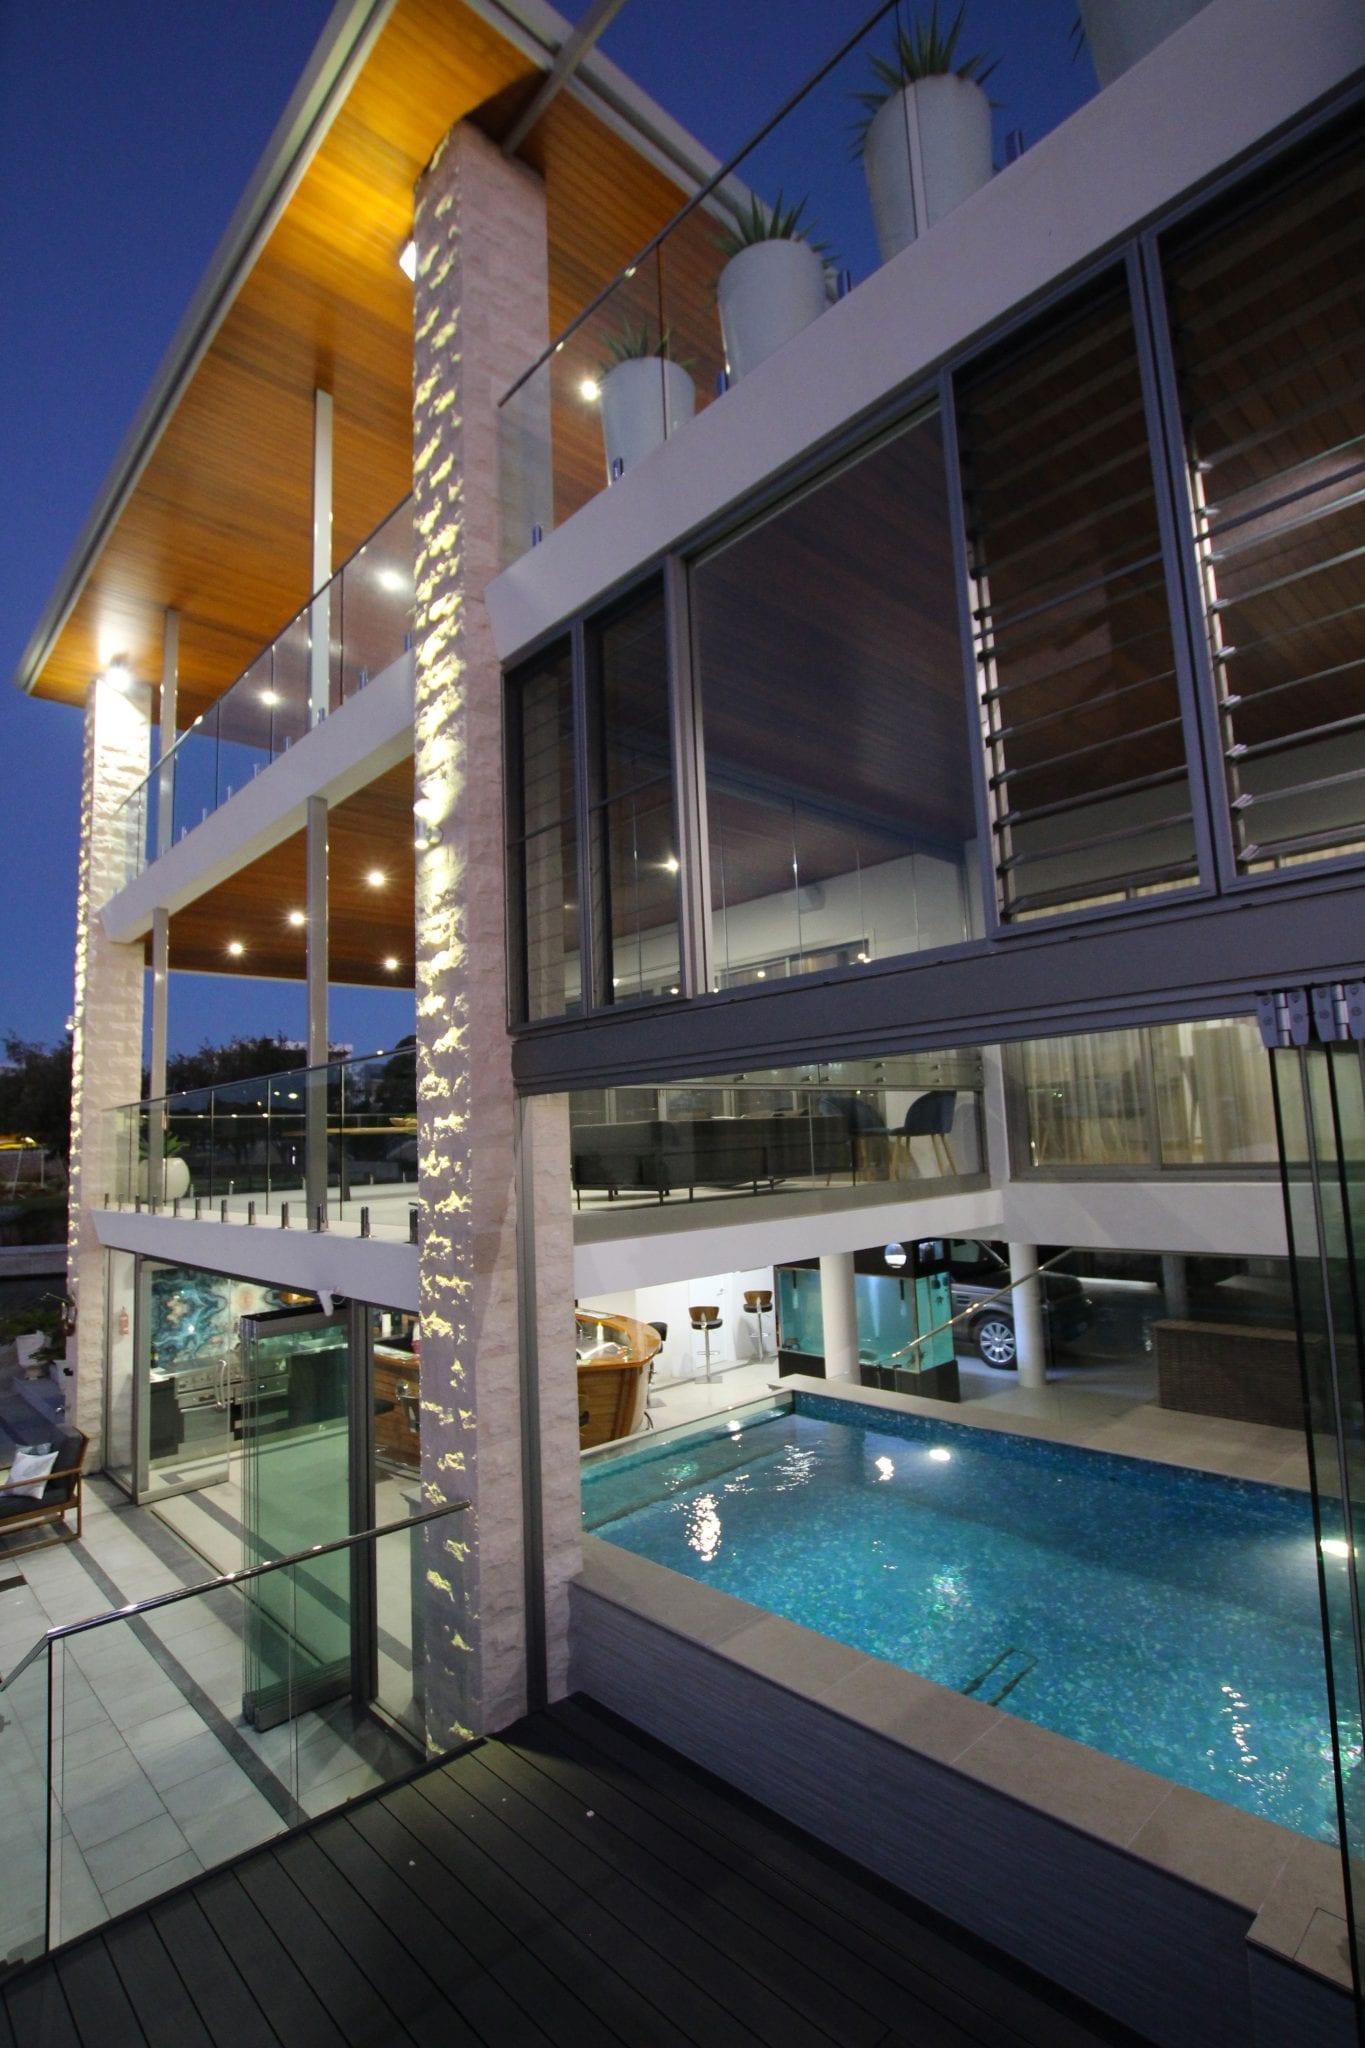 Bluestone Pools located in Perth, Western Australia